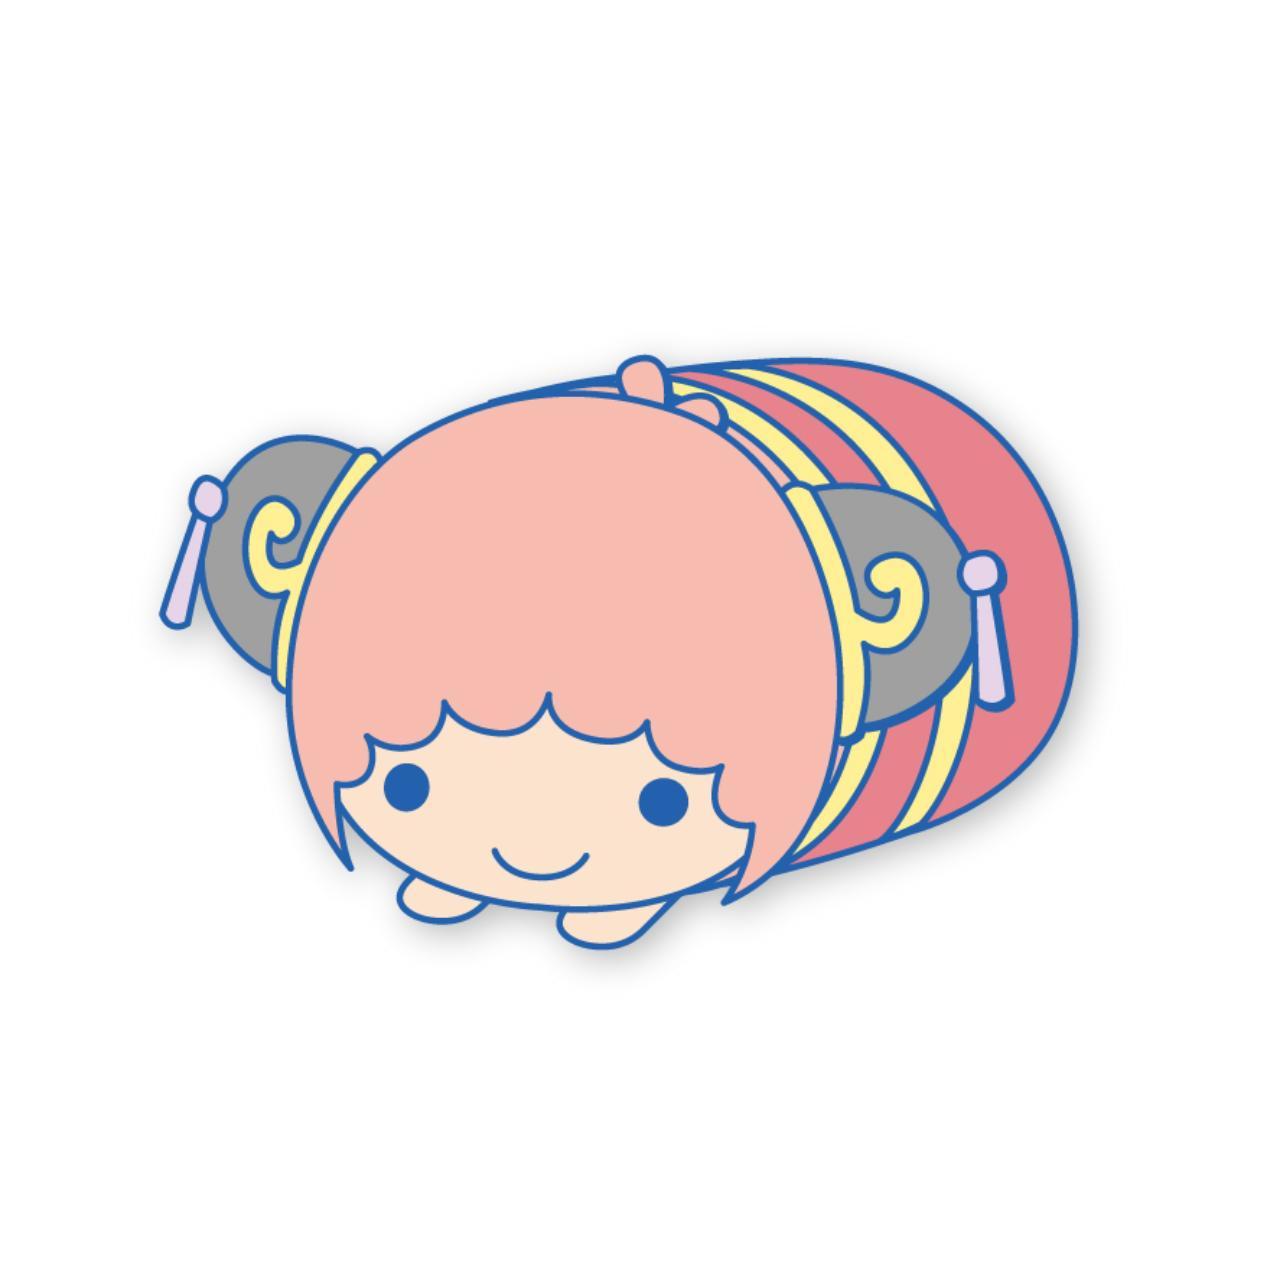 【BOX】銀魂×Sanrio characters もちころりん